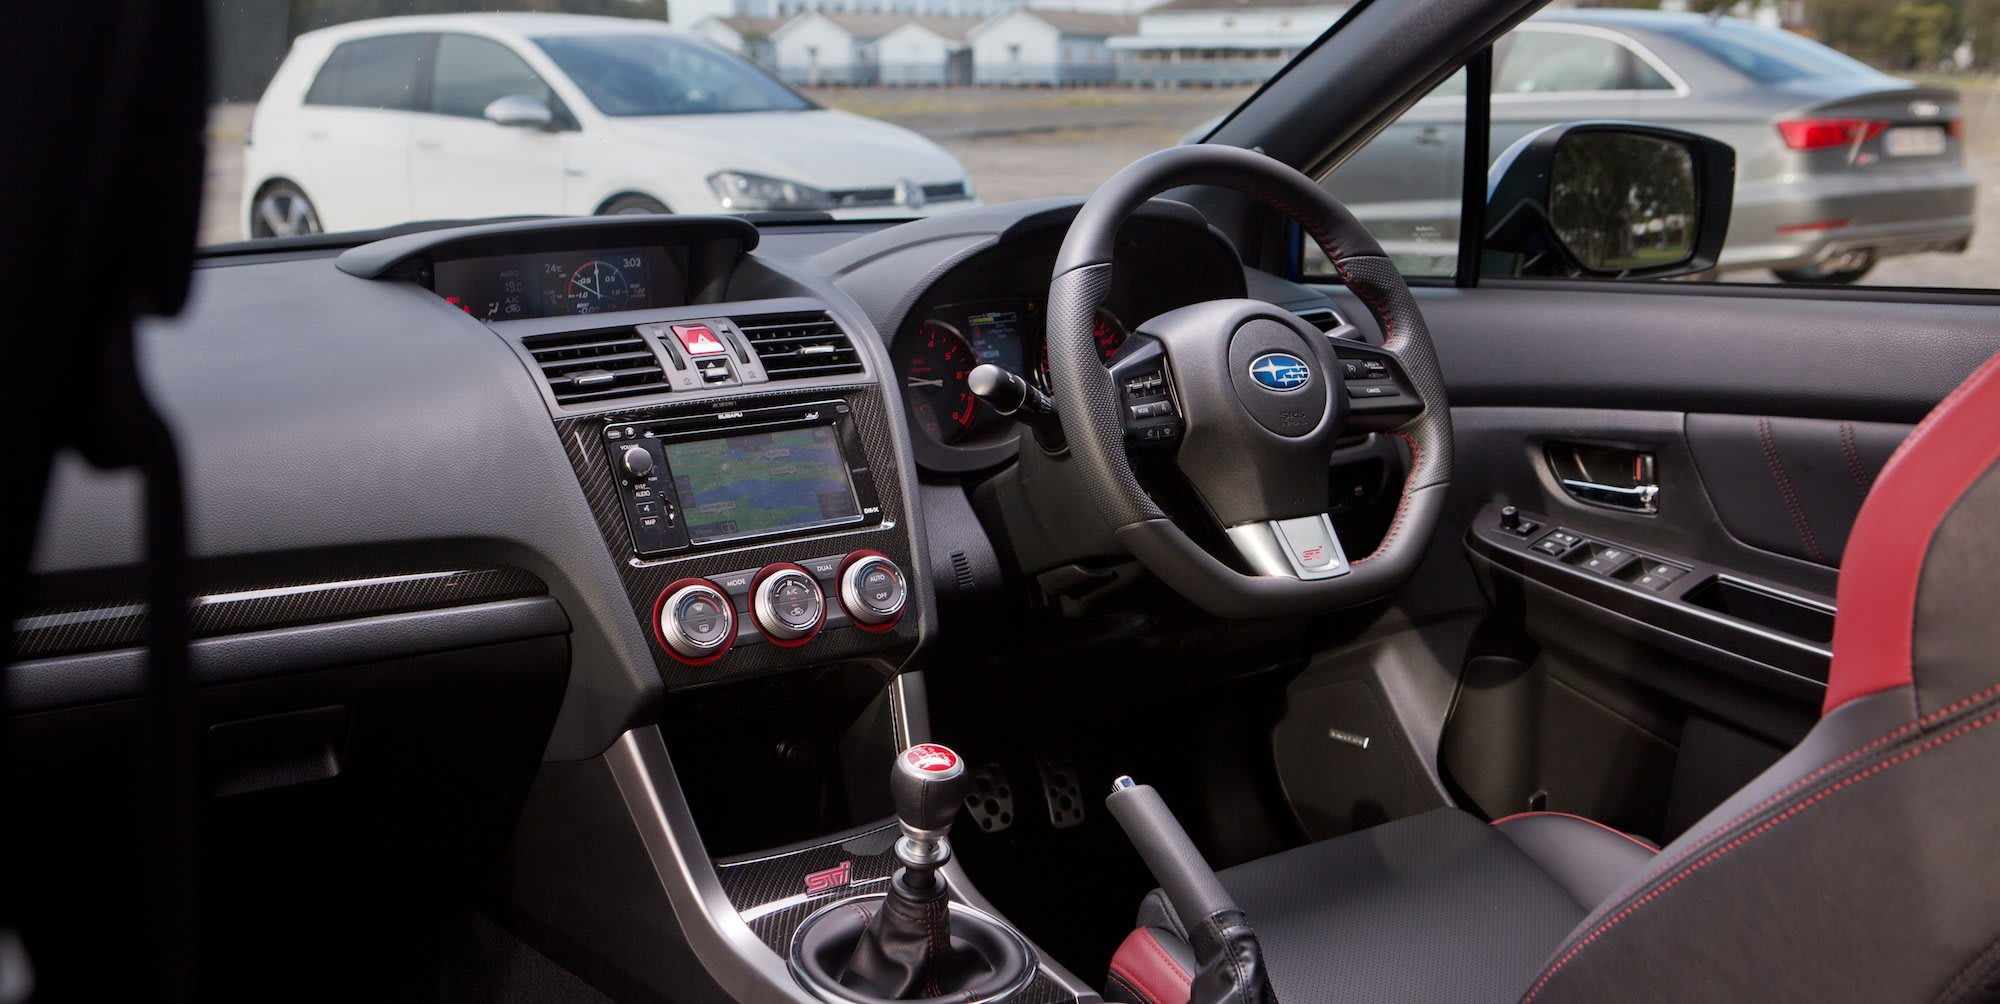 Subaru WRX STI Audi S3 Volkswagen Golf R 30